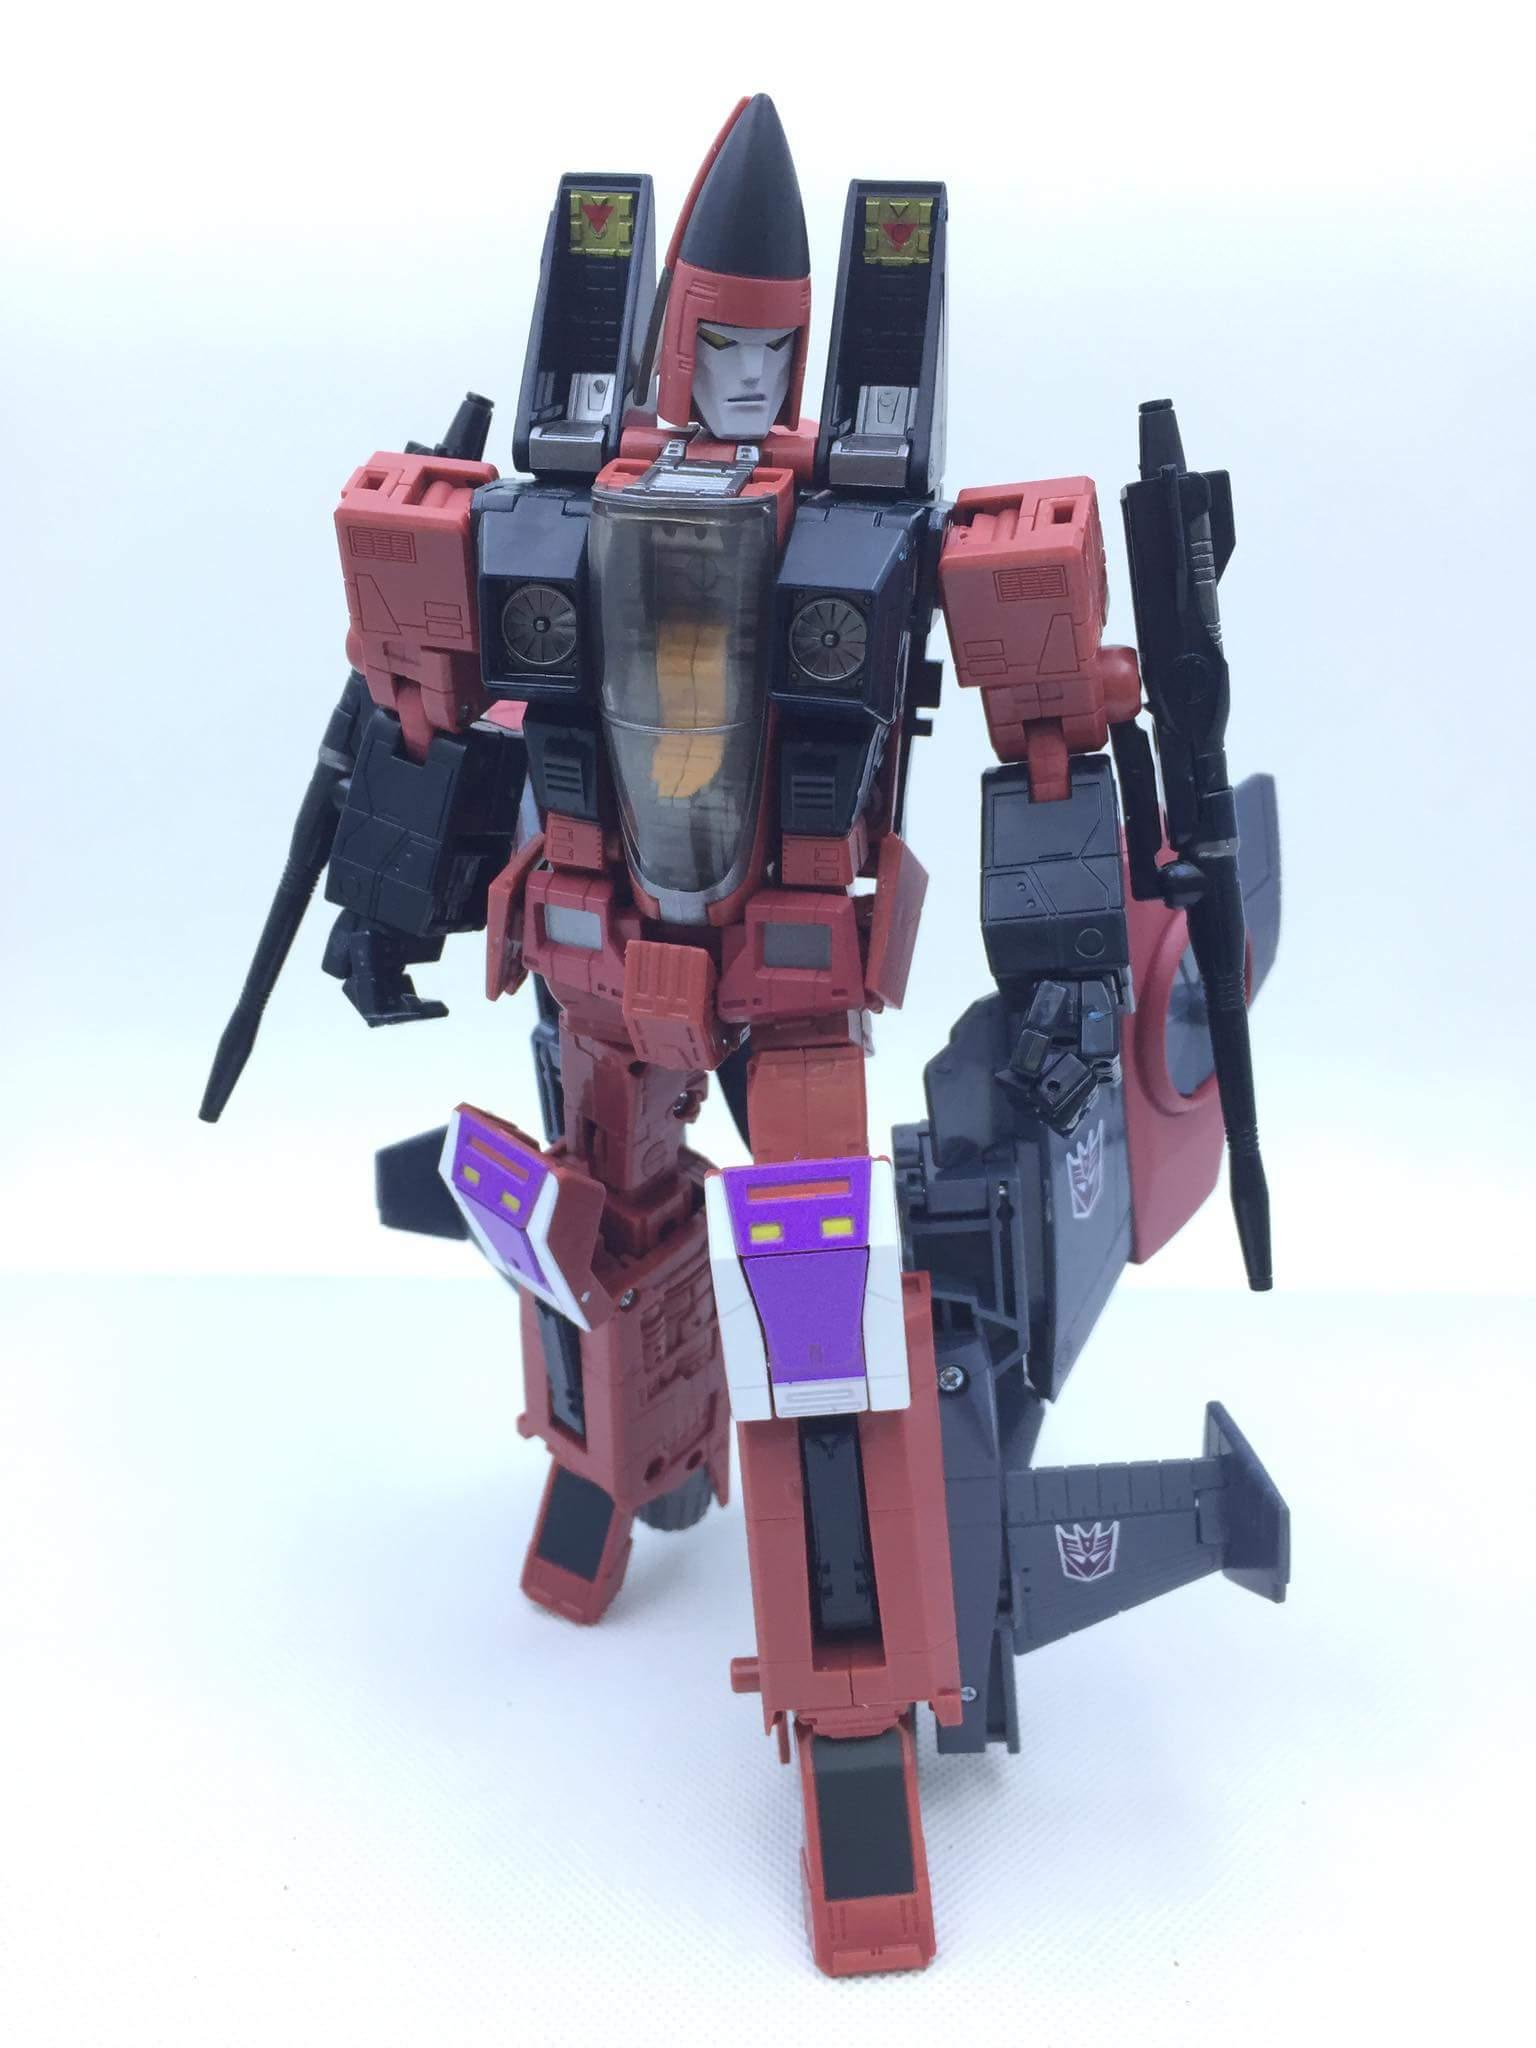 [Masterpiece] MP-11NT Thrust/Fatalo par Takara Tomy - Page 2 SyiCRm9H